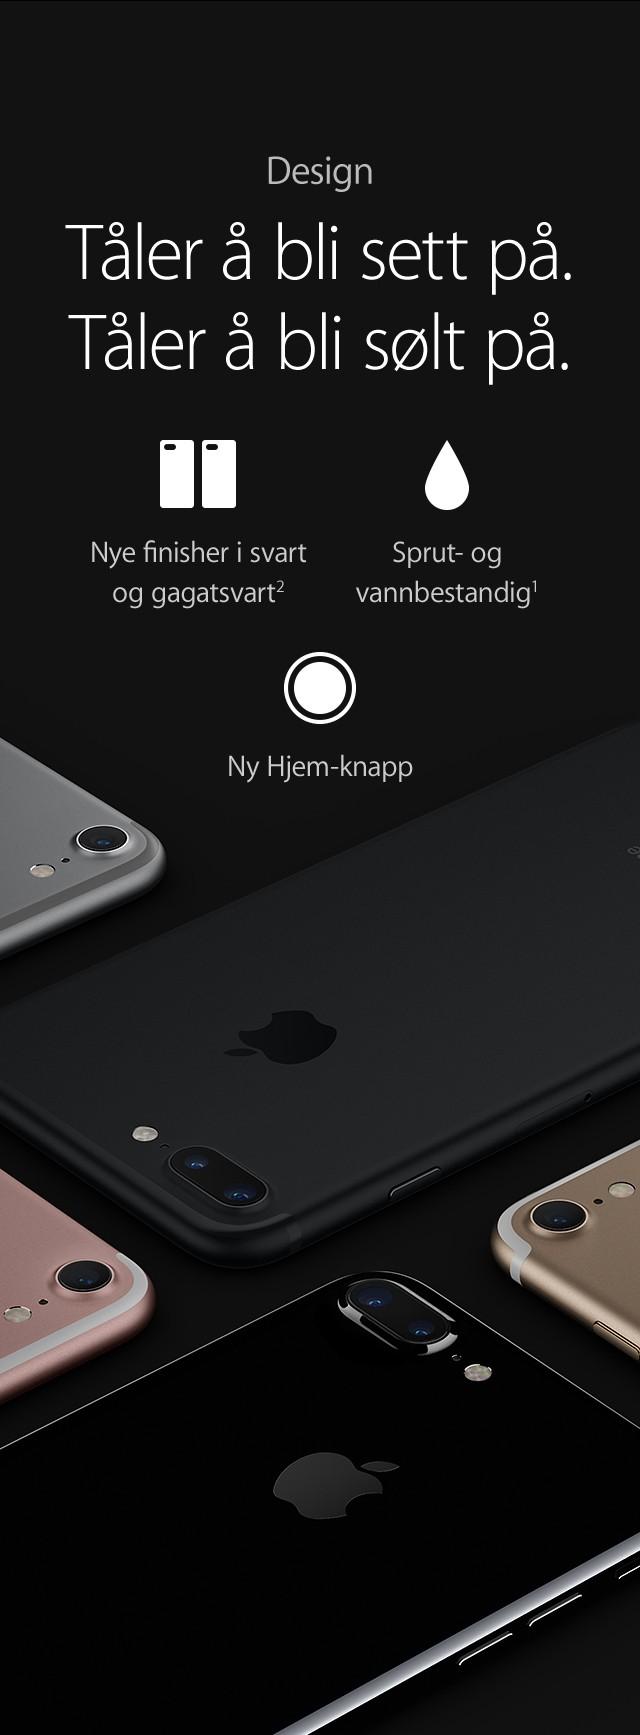 Kjøp iPhone 7 og iPhone 7 Plus hos Elkjøp